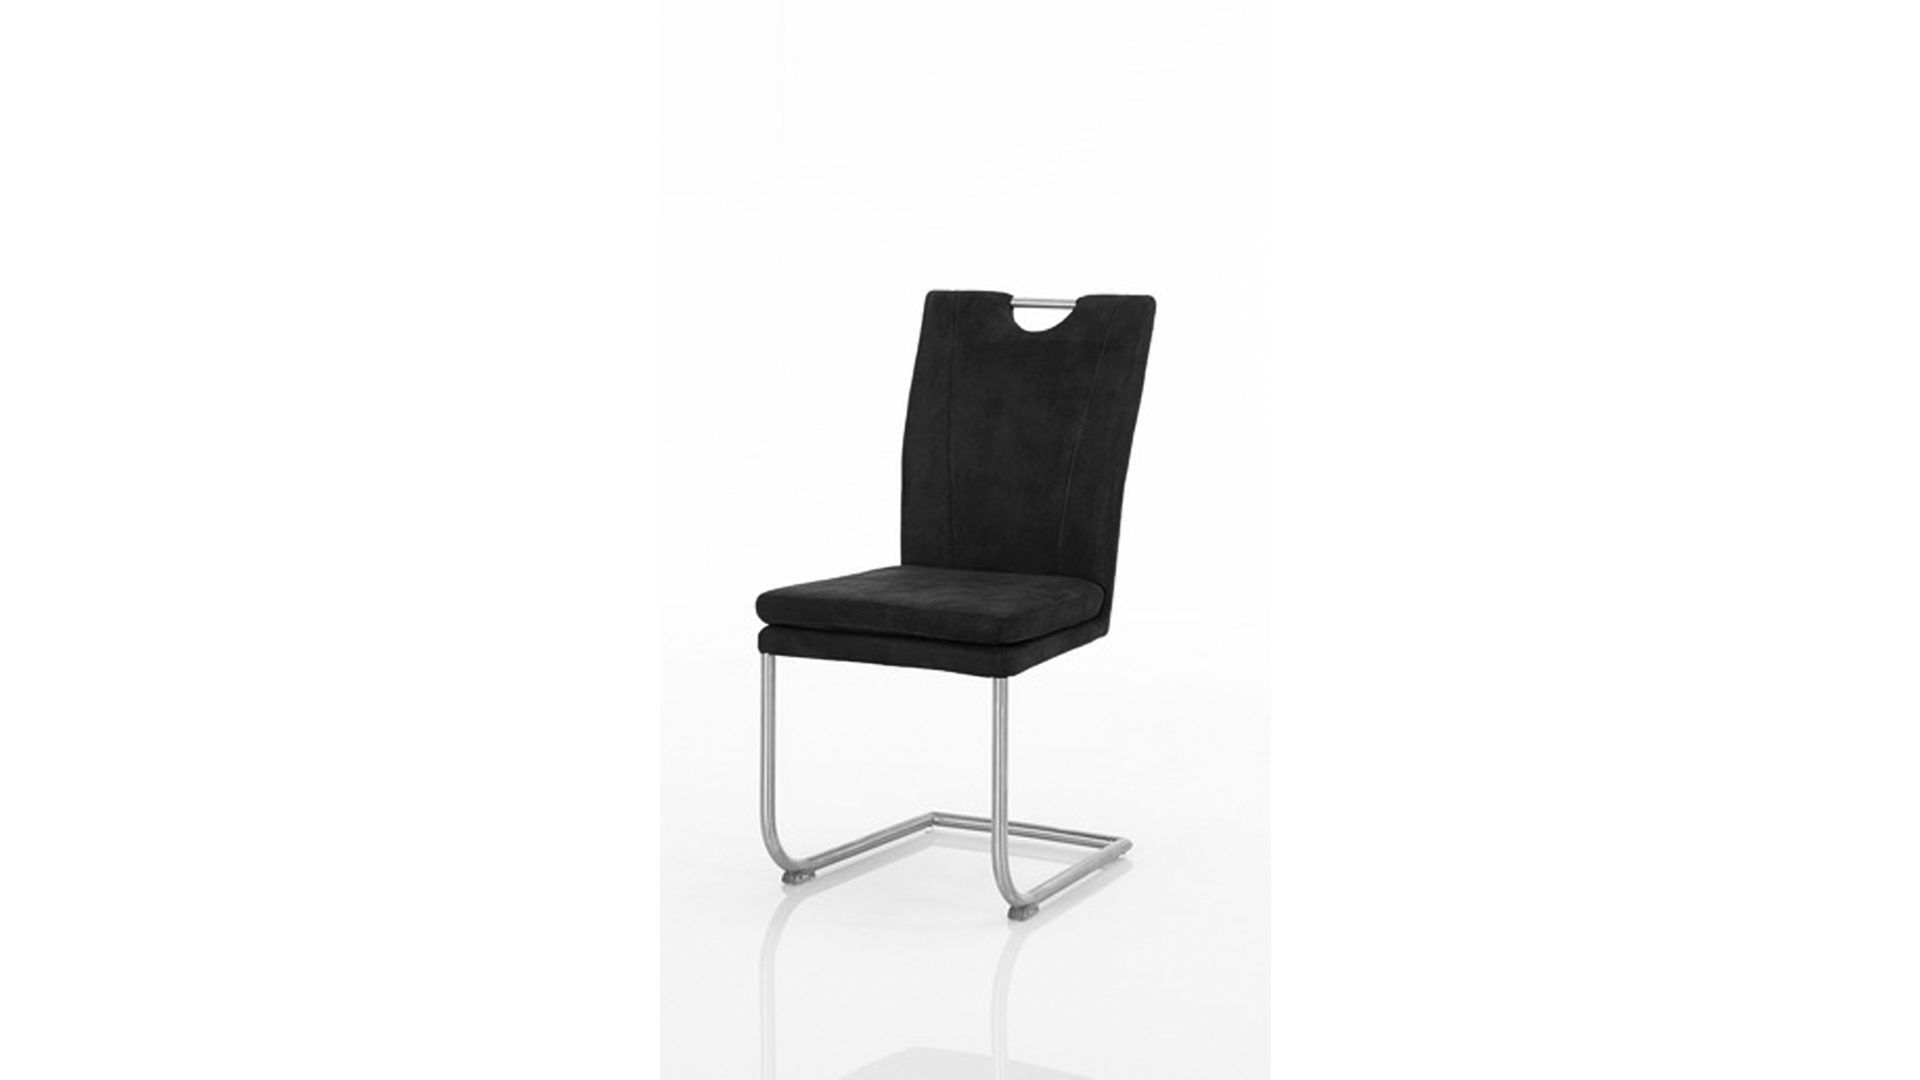 Möbel Hölzle Villingen Schwenningen Möbel A Z Stühle Bänke